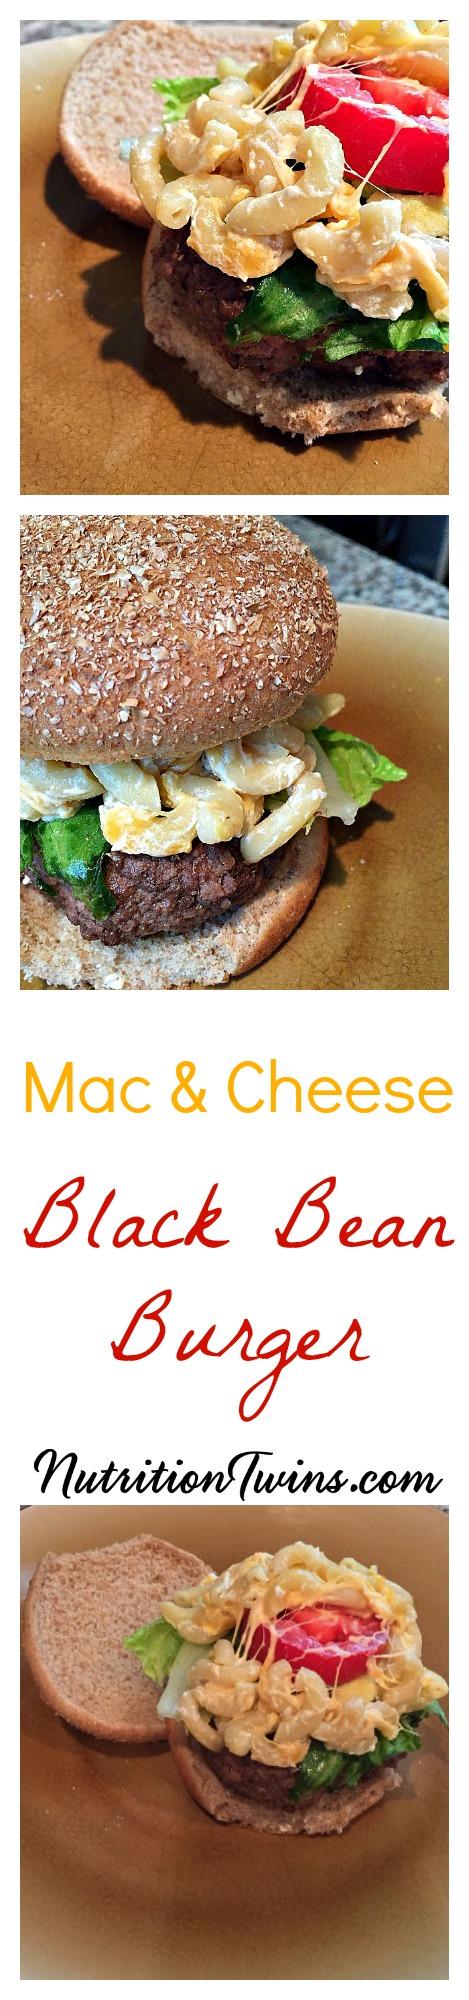 Mac_&Cheese_Black_bean_burger_pinterest